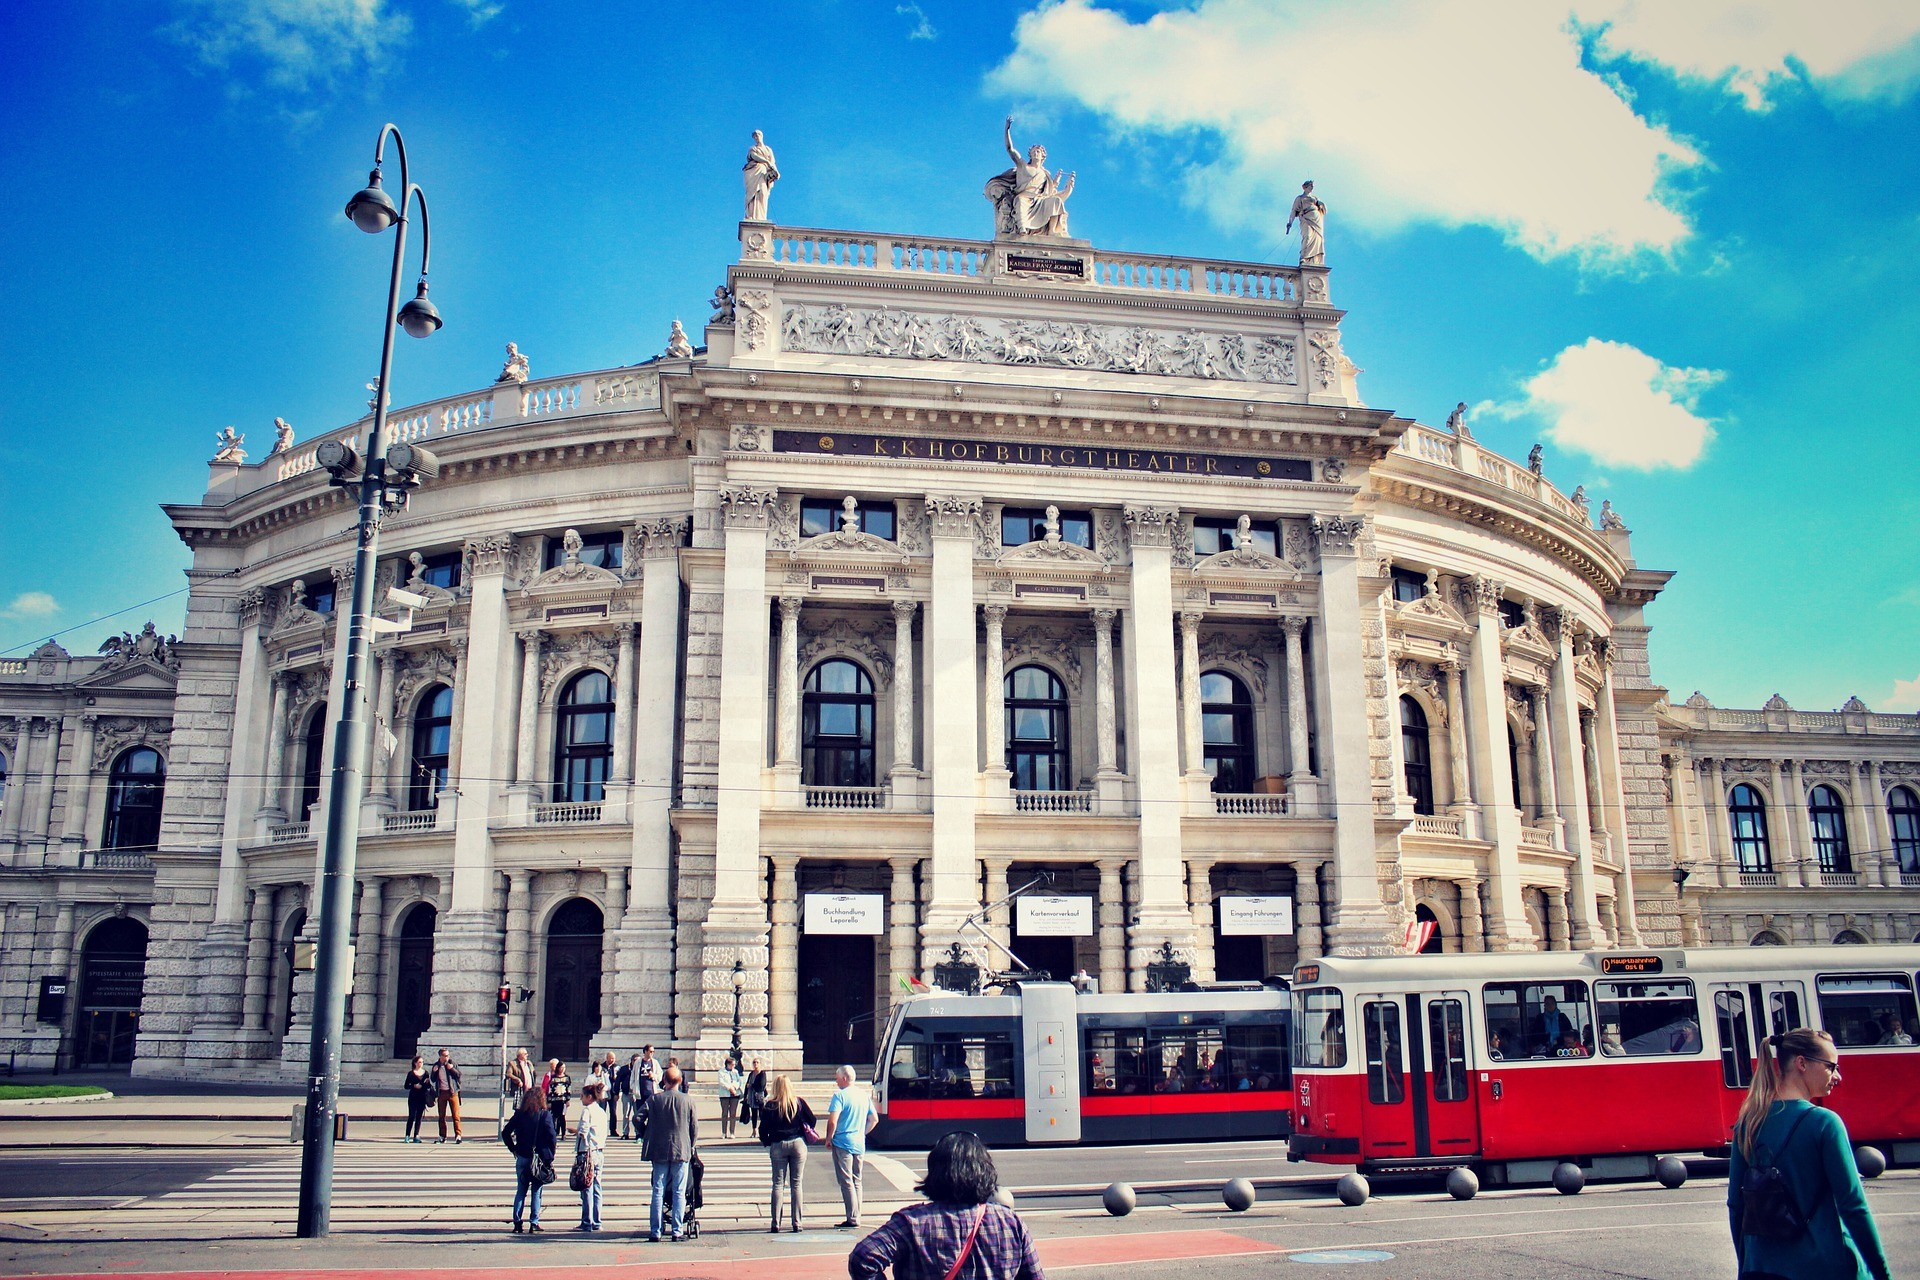 Come muoversi a Vienna - Foto di Waltteri Paulaharju